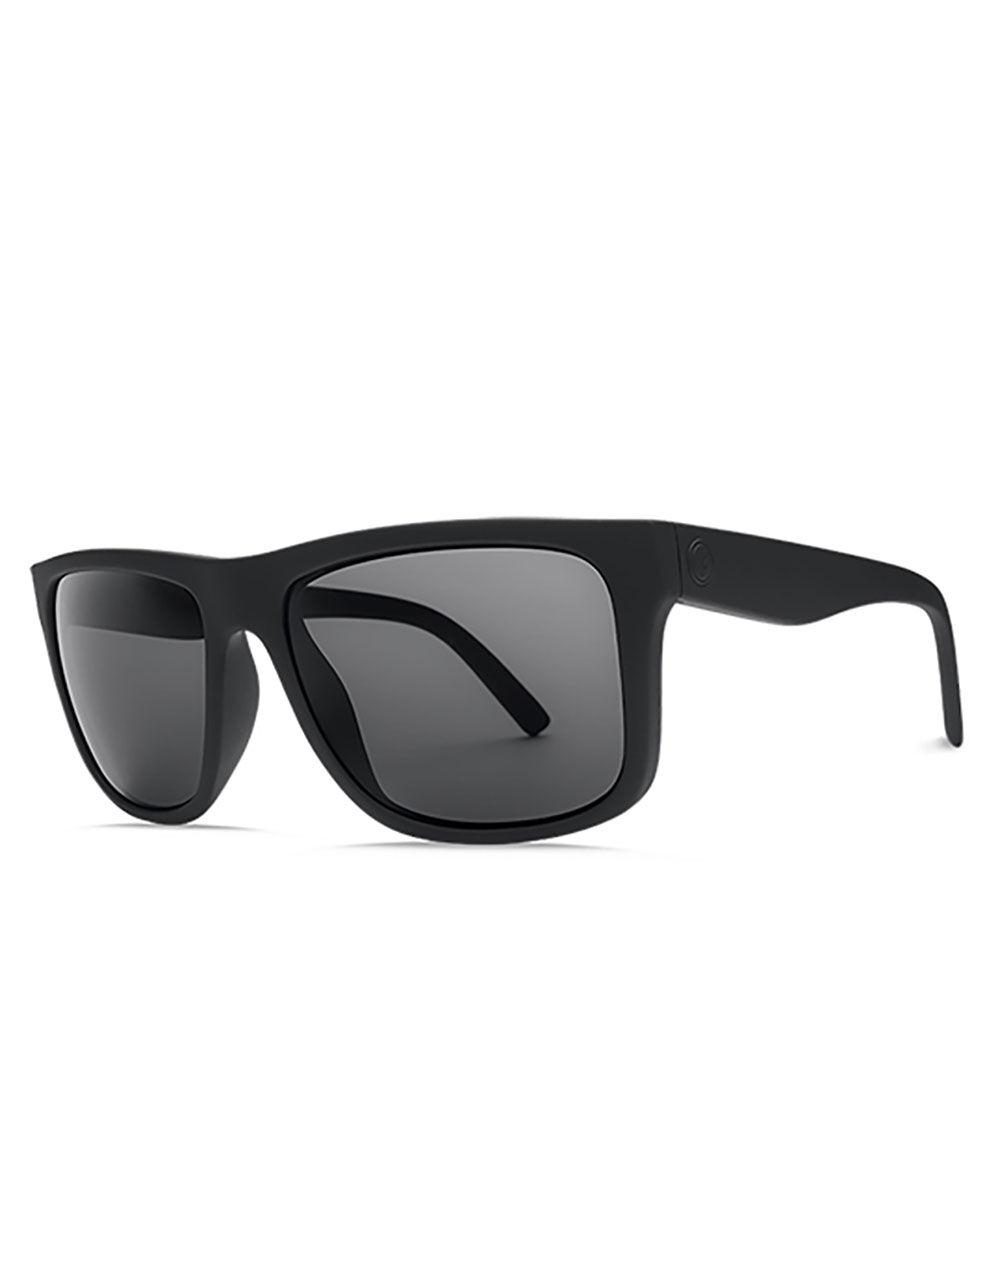 ELECTRIC Swingarm XL Polarized Sunglasses